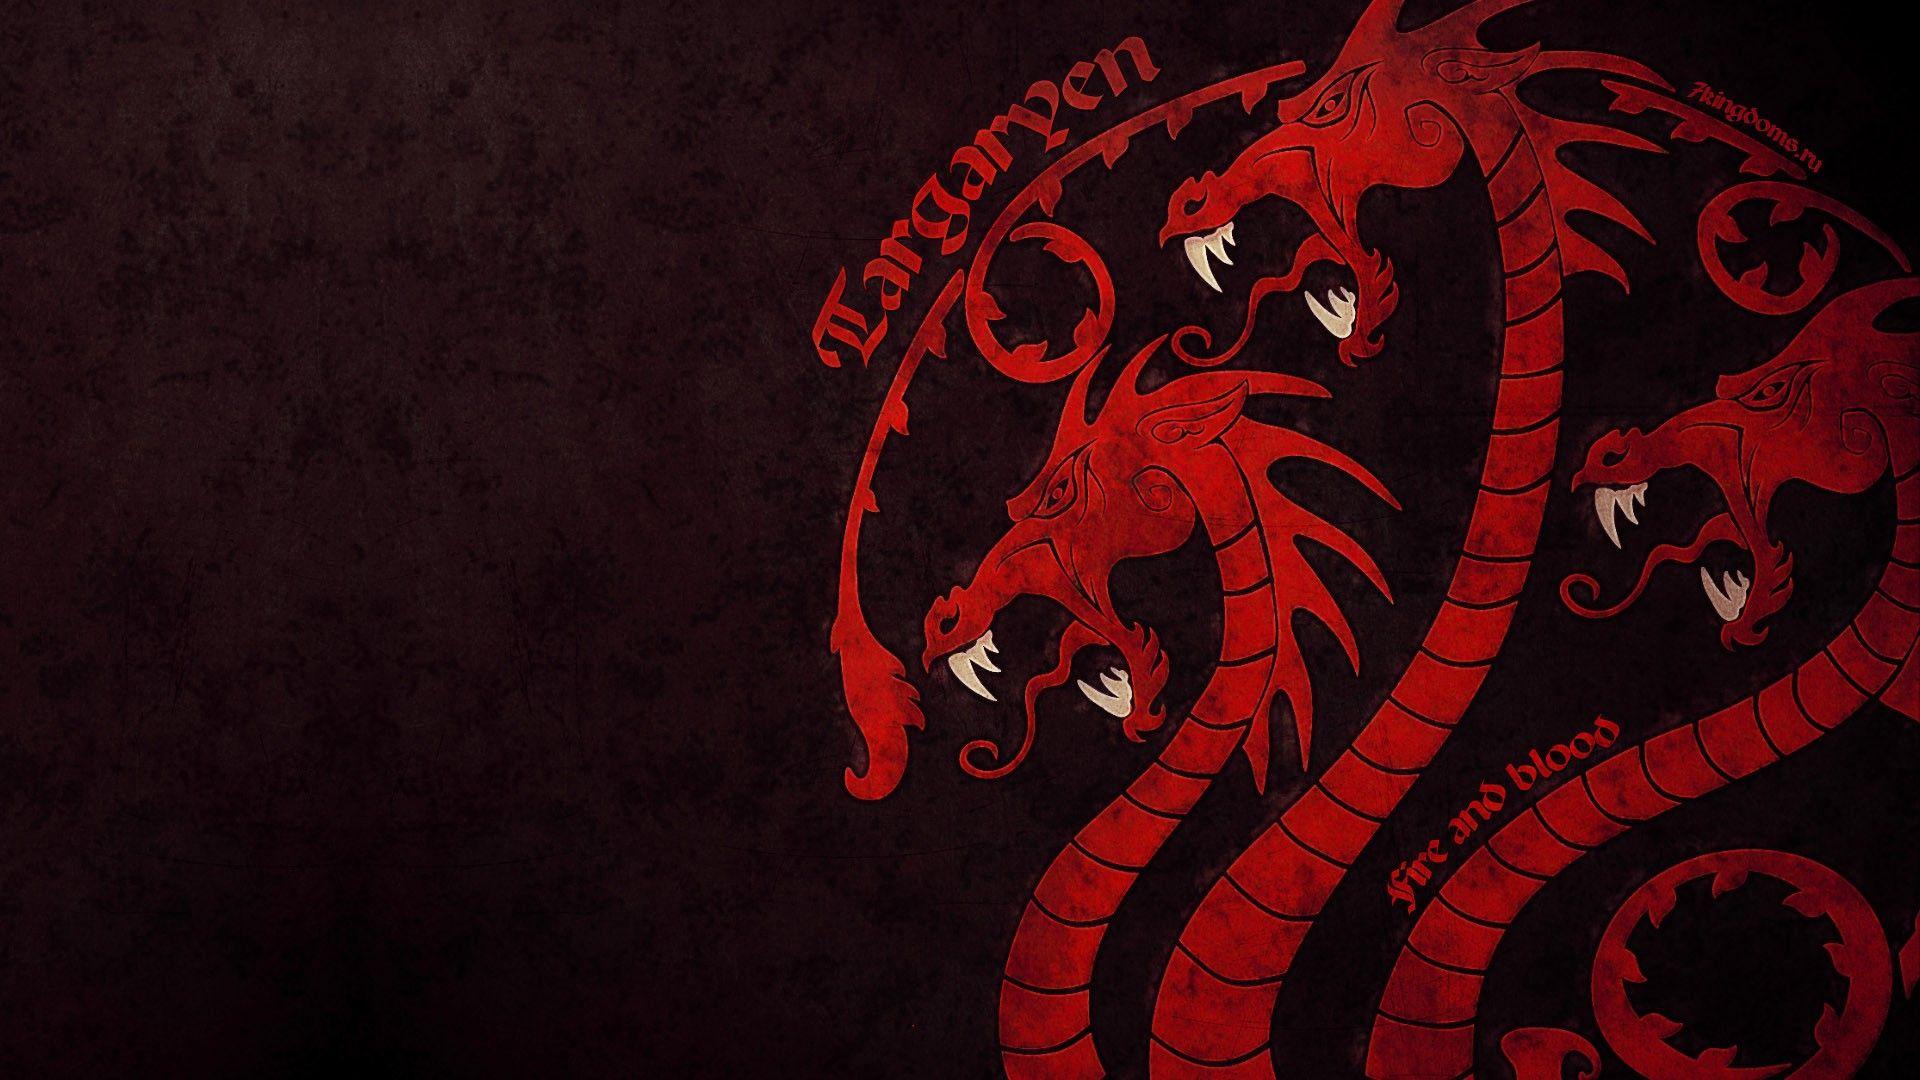 Game Of Thrones Computer Wallpapers Desktop Backgrounds 1920x1080 Id 396999 Game Of Thrones Art Targaryen Sigil Game Of Thrones Dragons